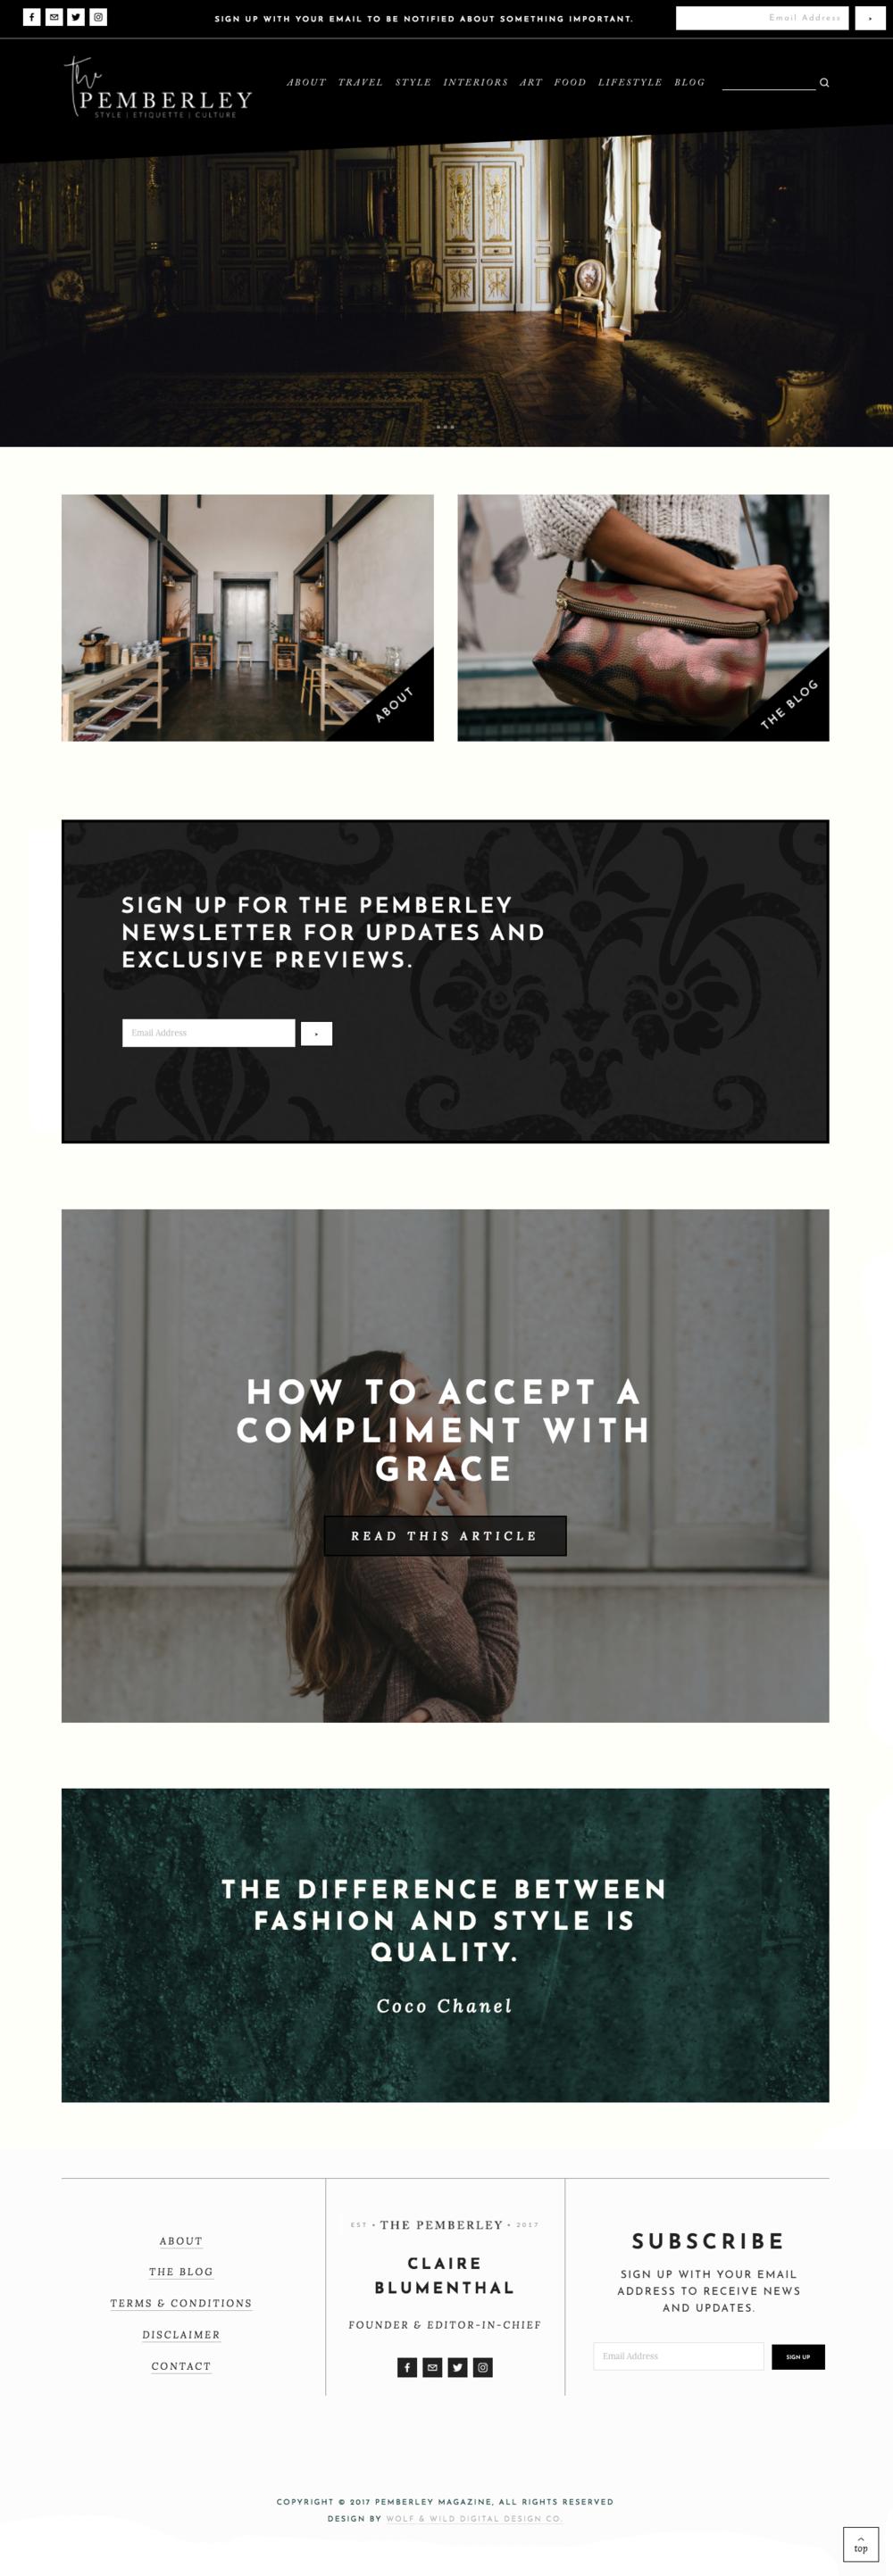 Pemberley Magazine Website